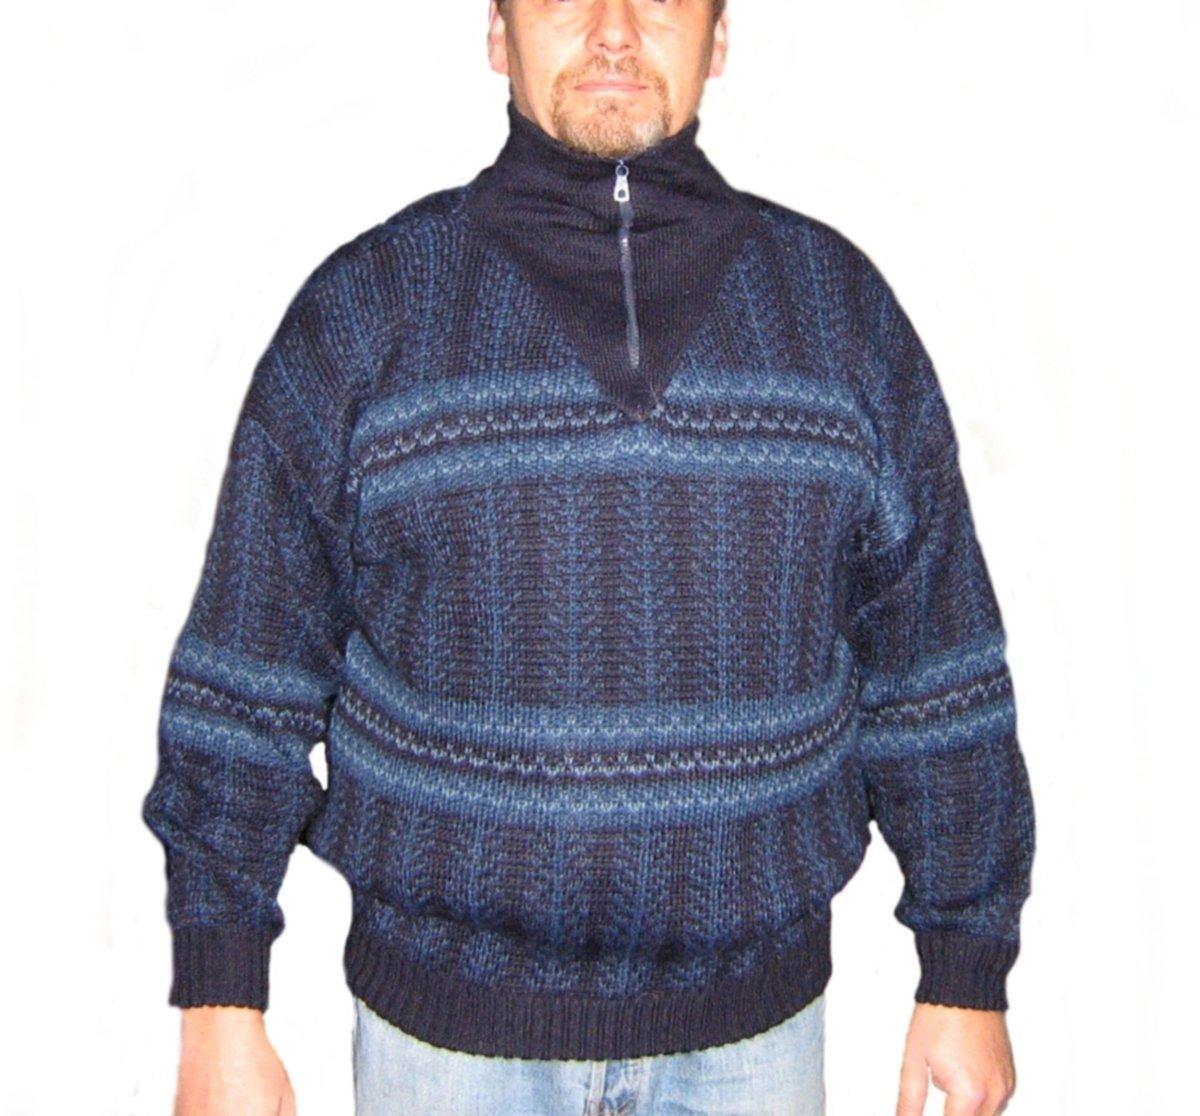 Alpakaandmore Mens Thick Turtleneck Pullover Peruvian Alpaca Wool Blue Tones (Small)